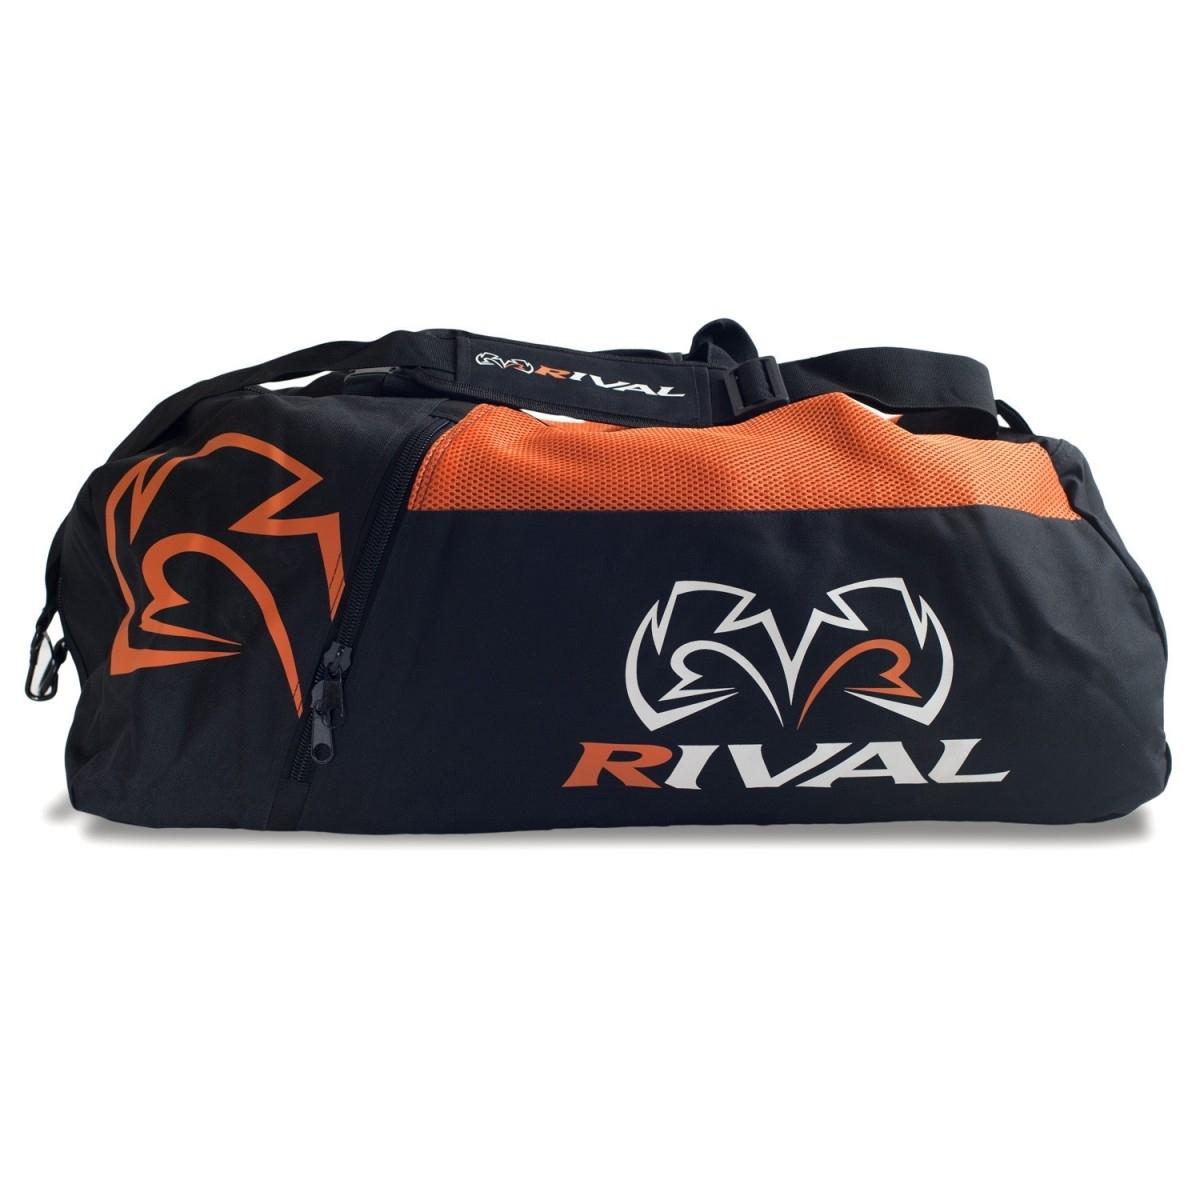 3db70e3b9cd5 Спортивная сумка-рюкзак RIVAL RGB50 Gym Bag купить в интернет ...